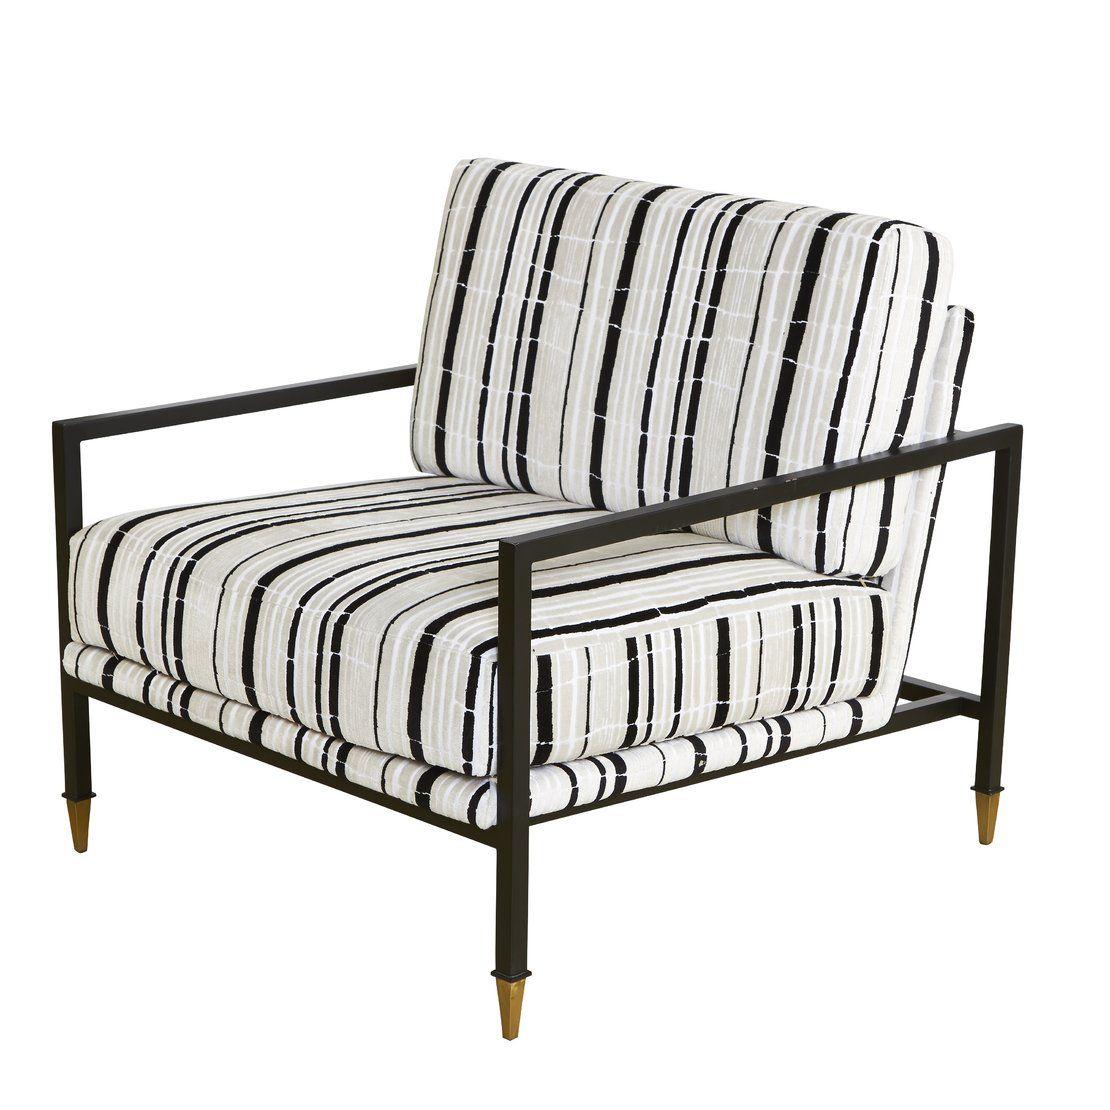 Florence Broadhurst Sydney Armchair Black And White Pinterest